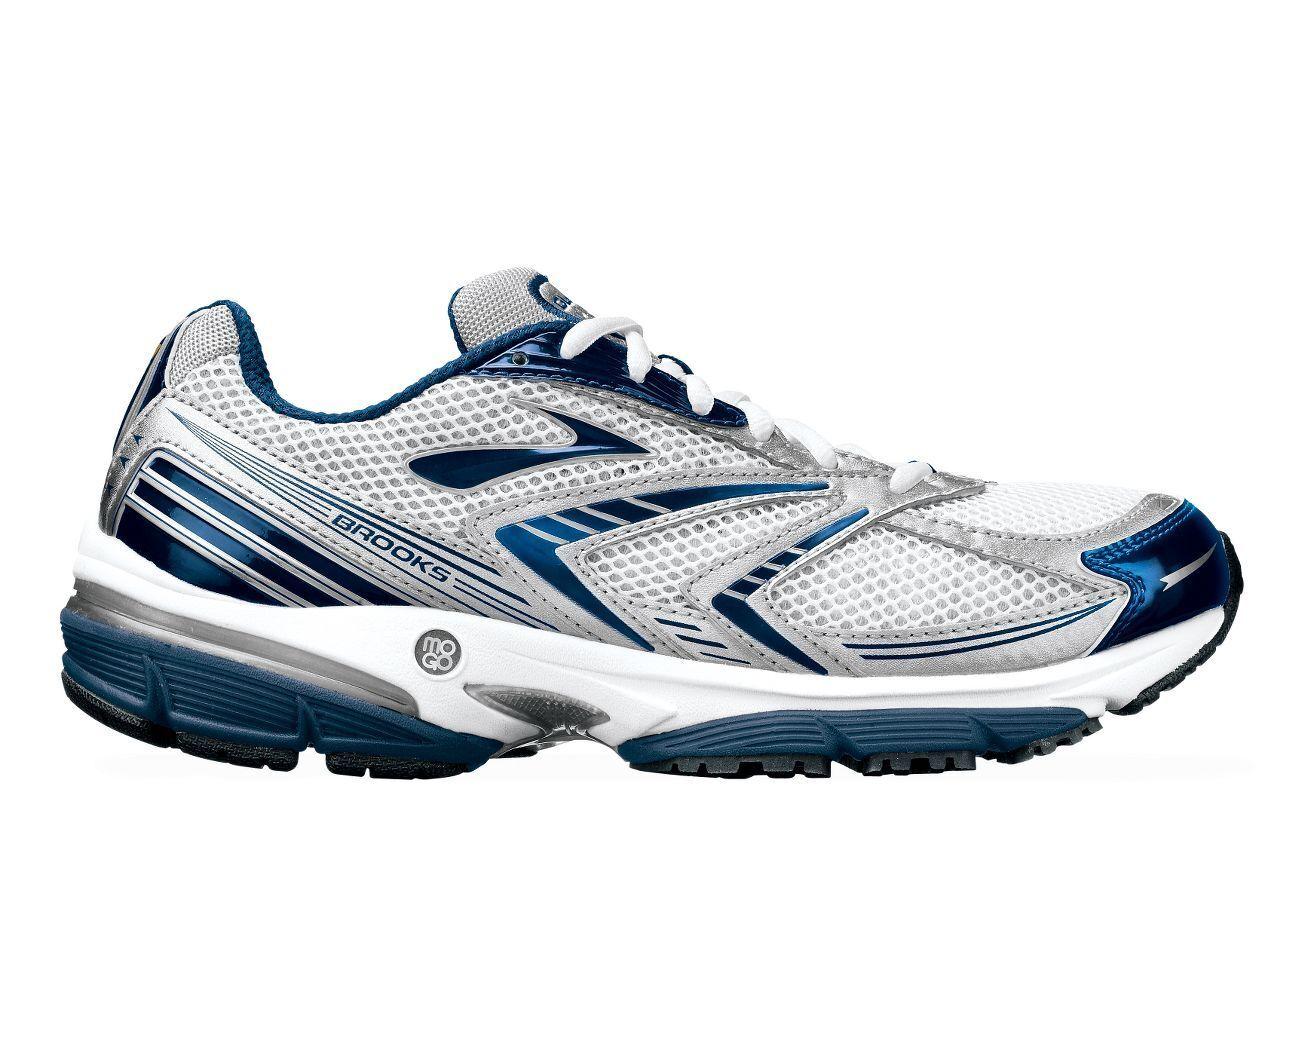 Brooks Glycerin 7 Uomo Running Runner scarpe scarpe scarpe (D) (143) 381957